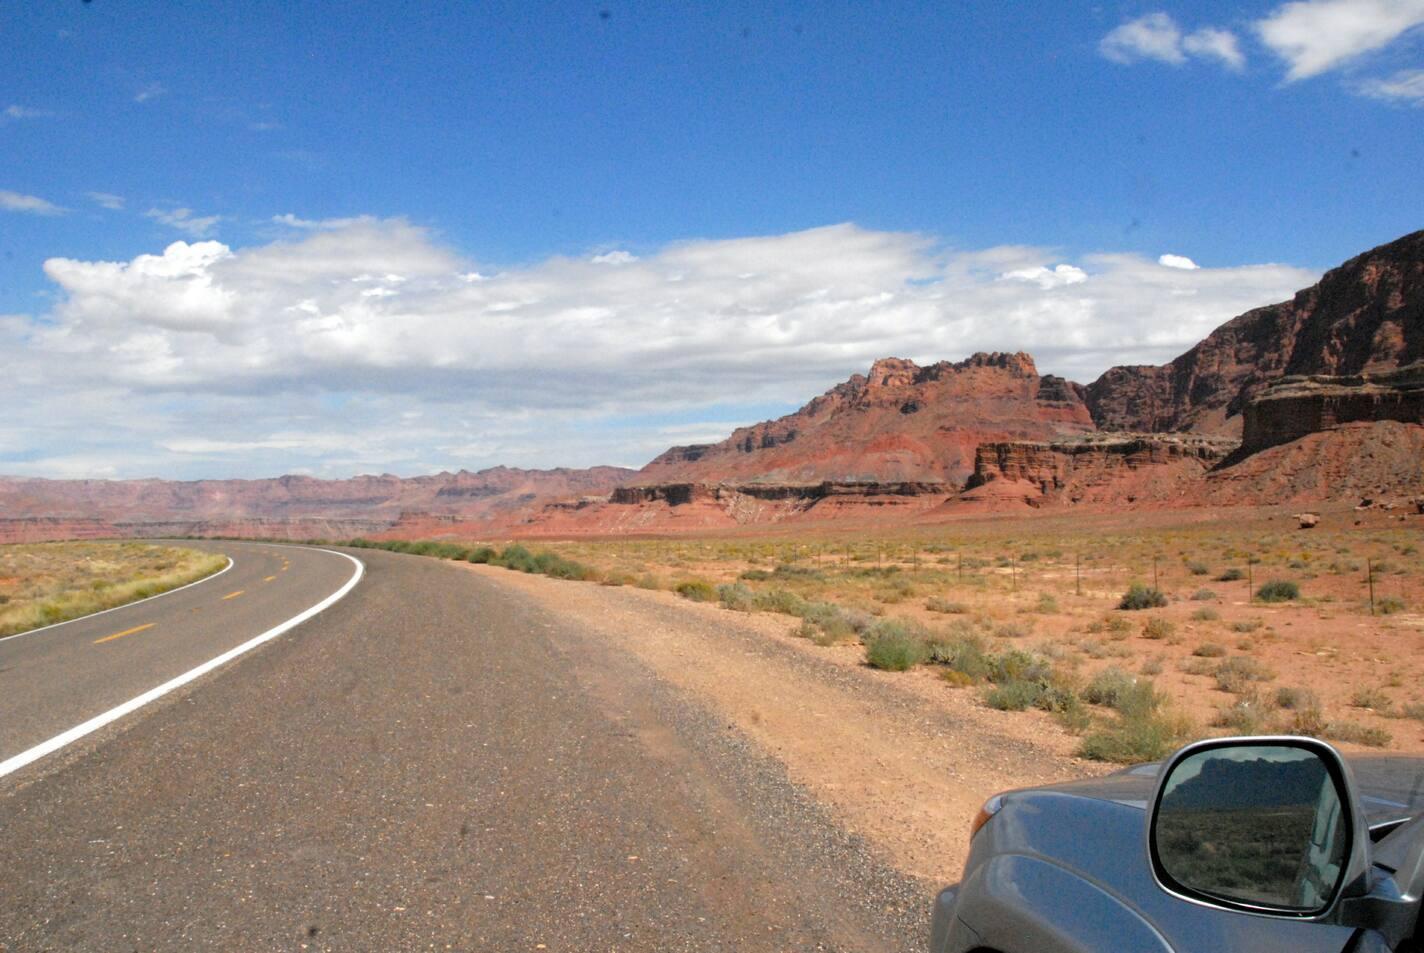 On the way to Vermillion Cliffs